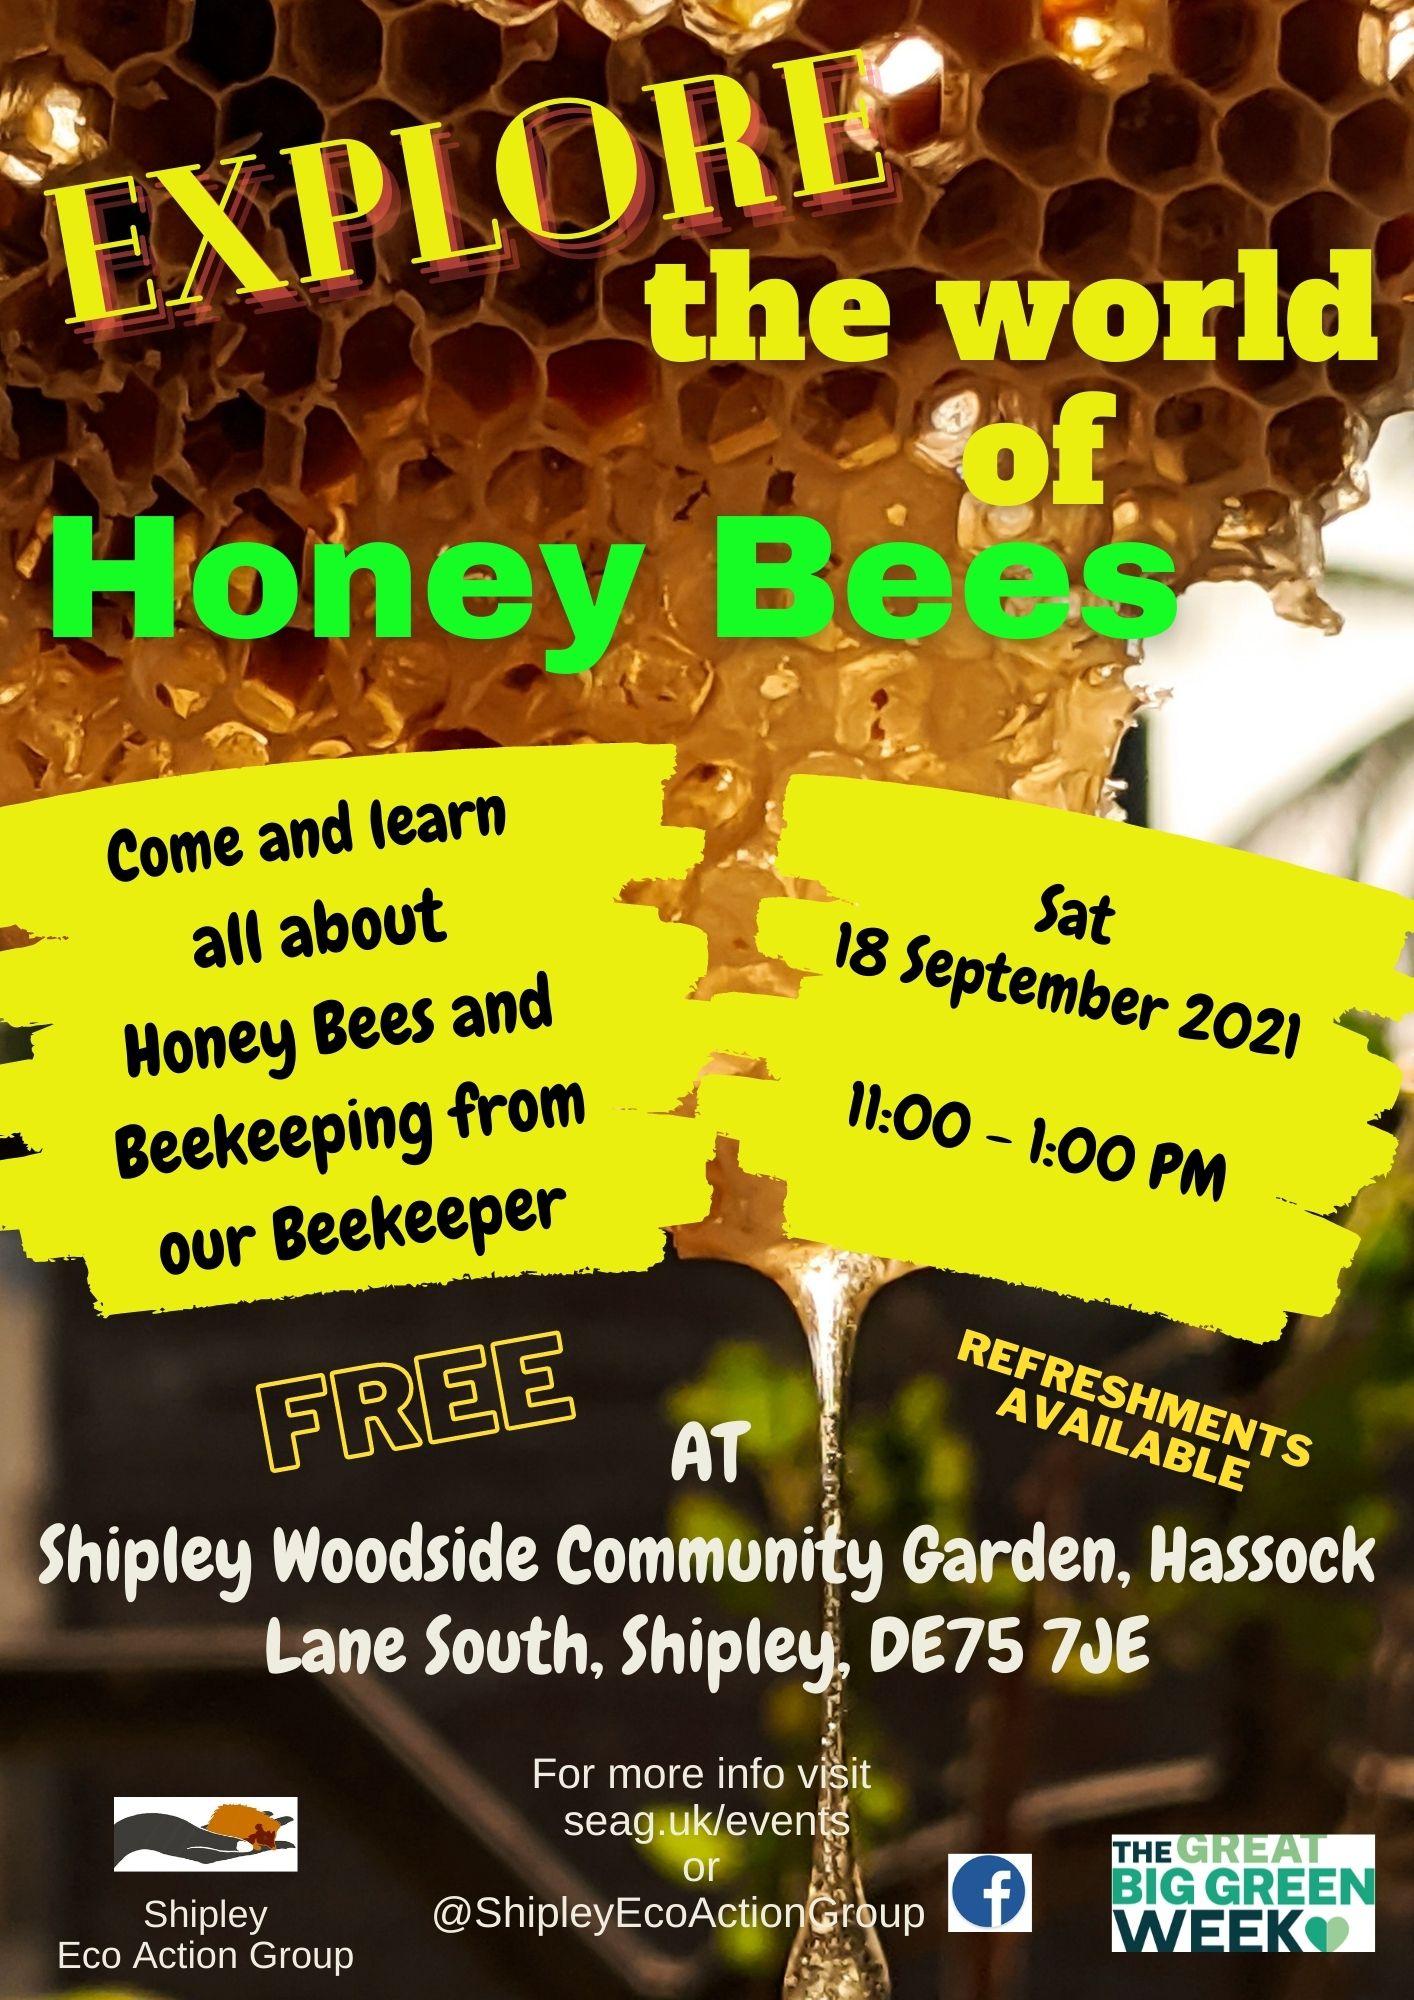 Explore the world of Honey Bees